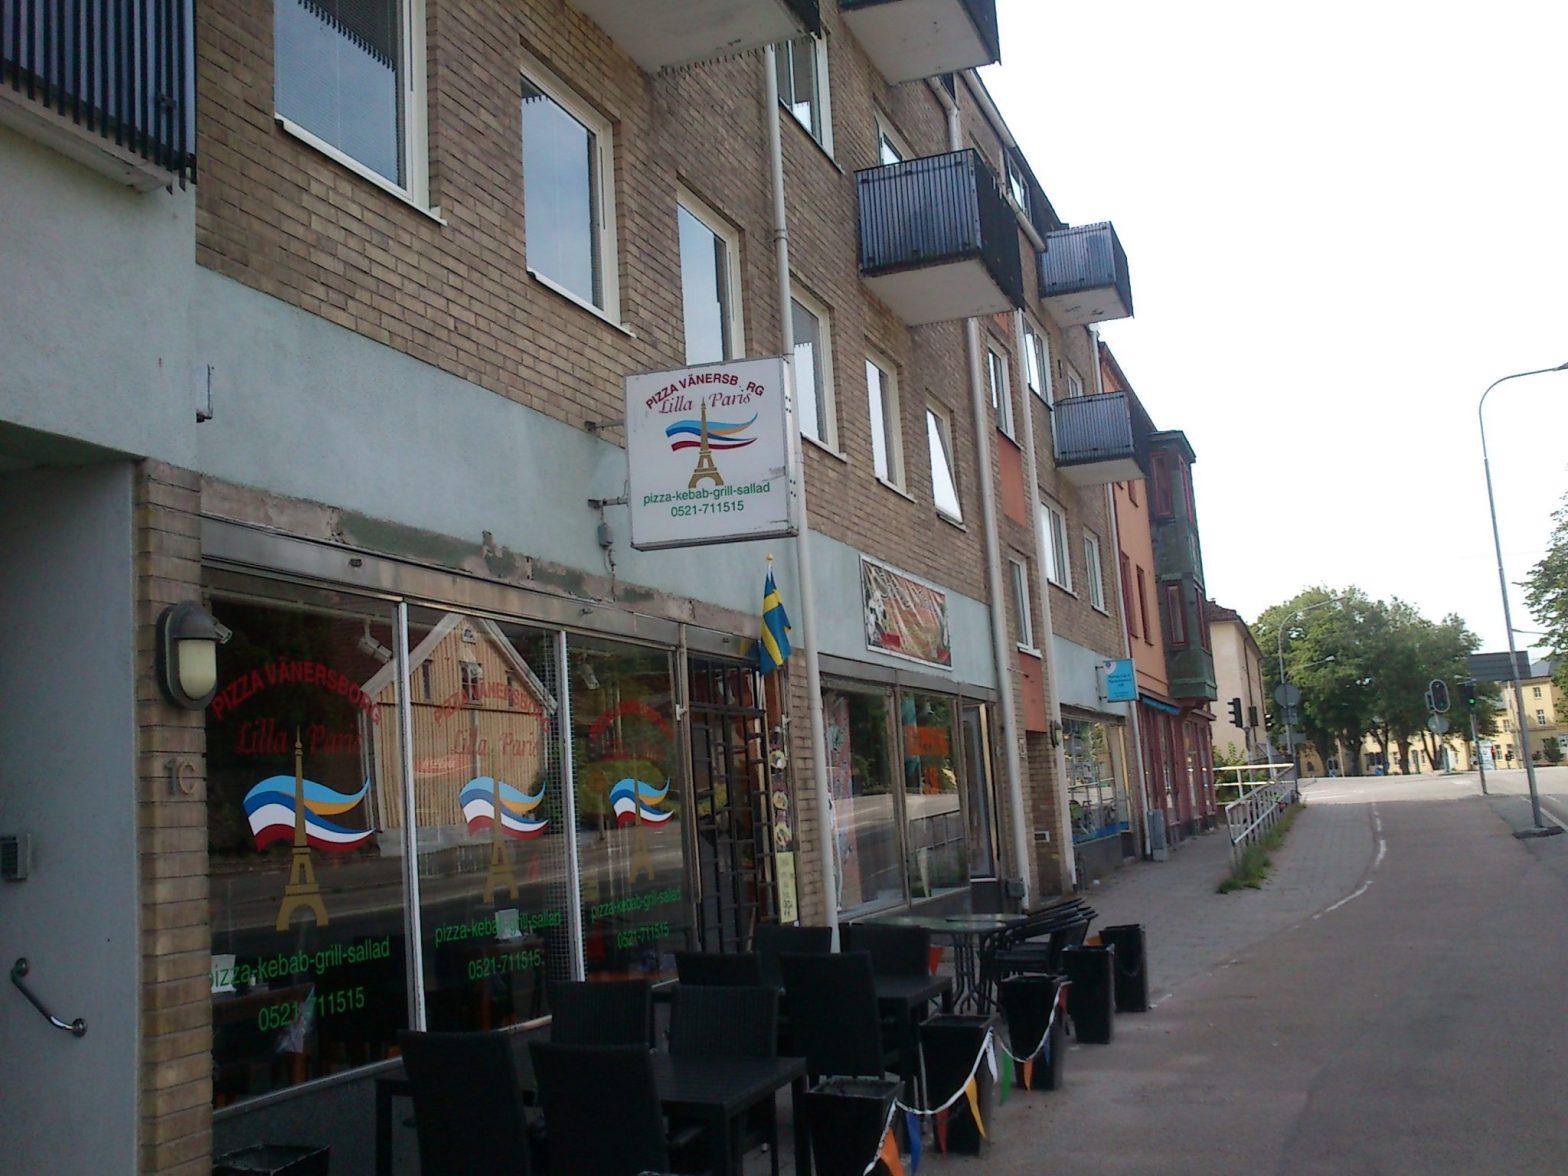 Pizzeria Lilla Paris, Vänersborg